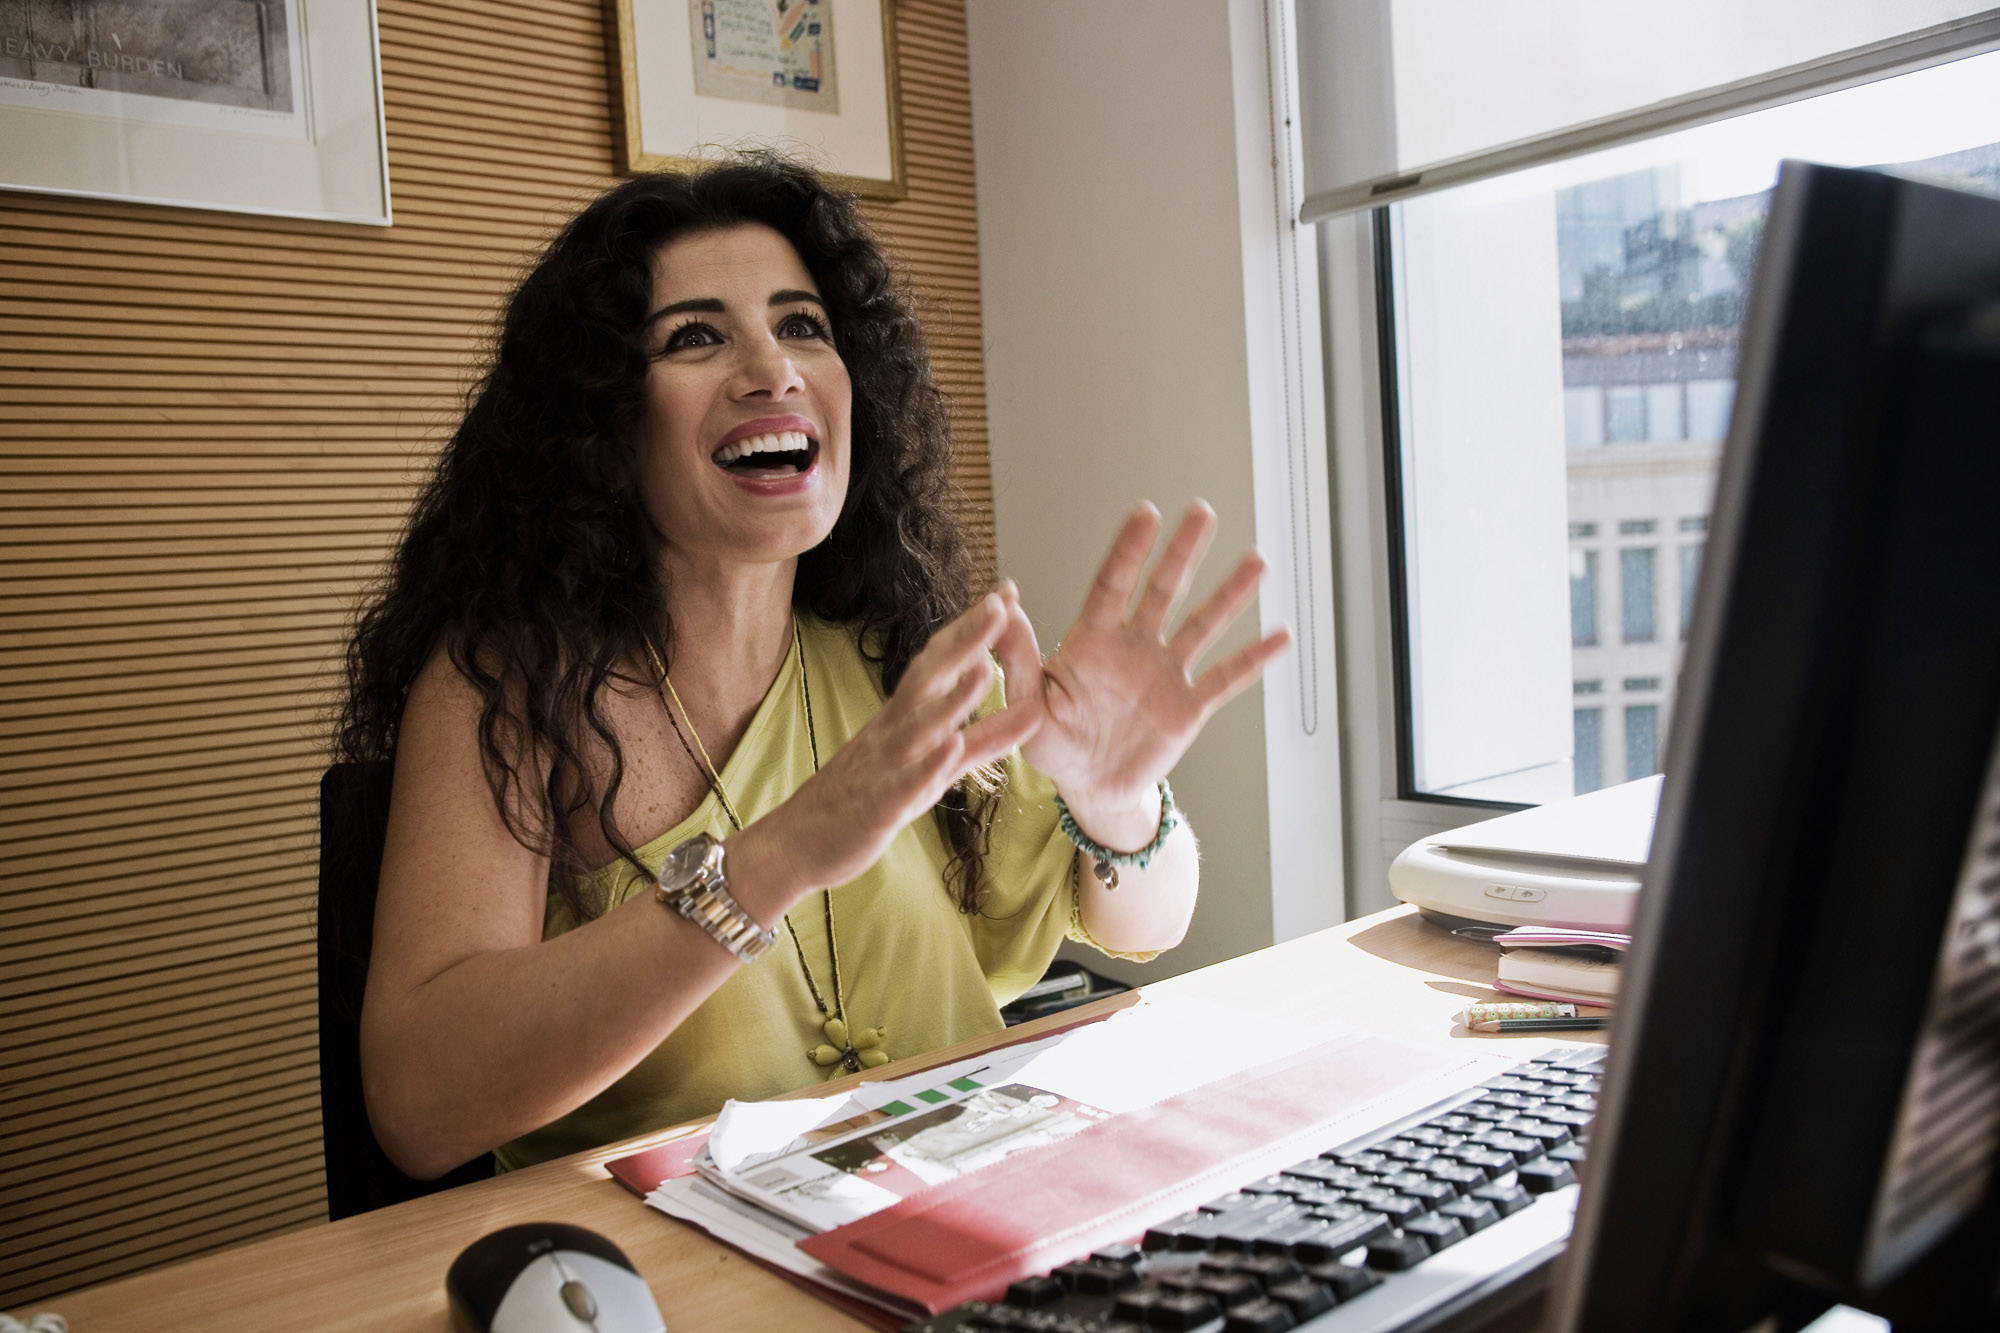 2010 - Portraits Joumana Haddad, journaliste et ecrivaine feministe libanaise.